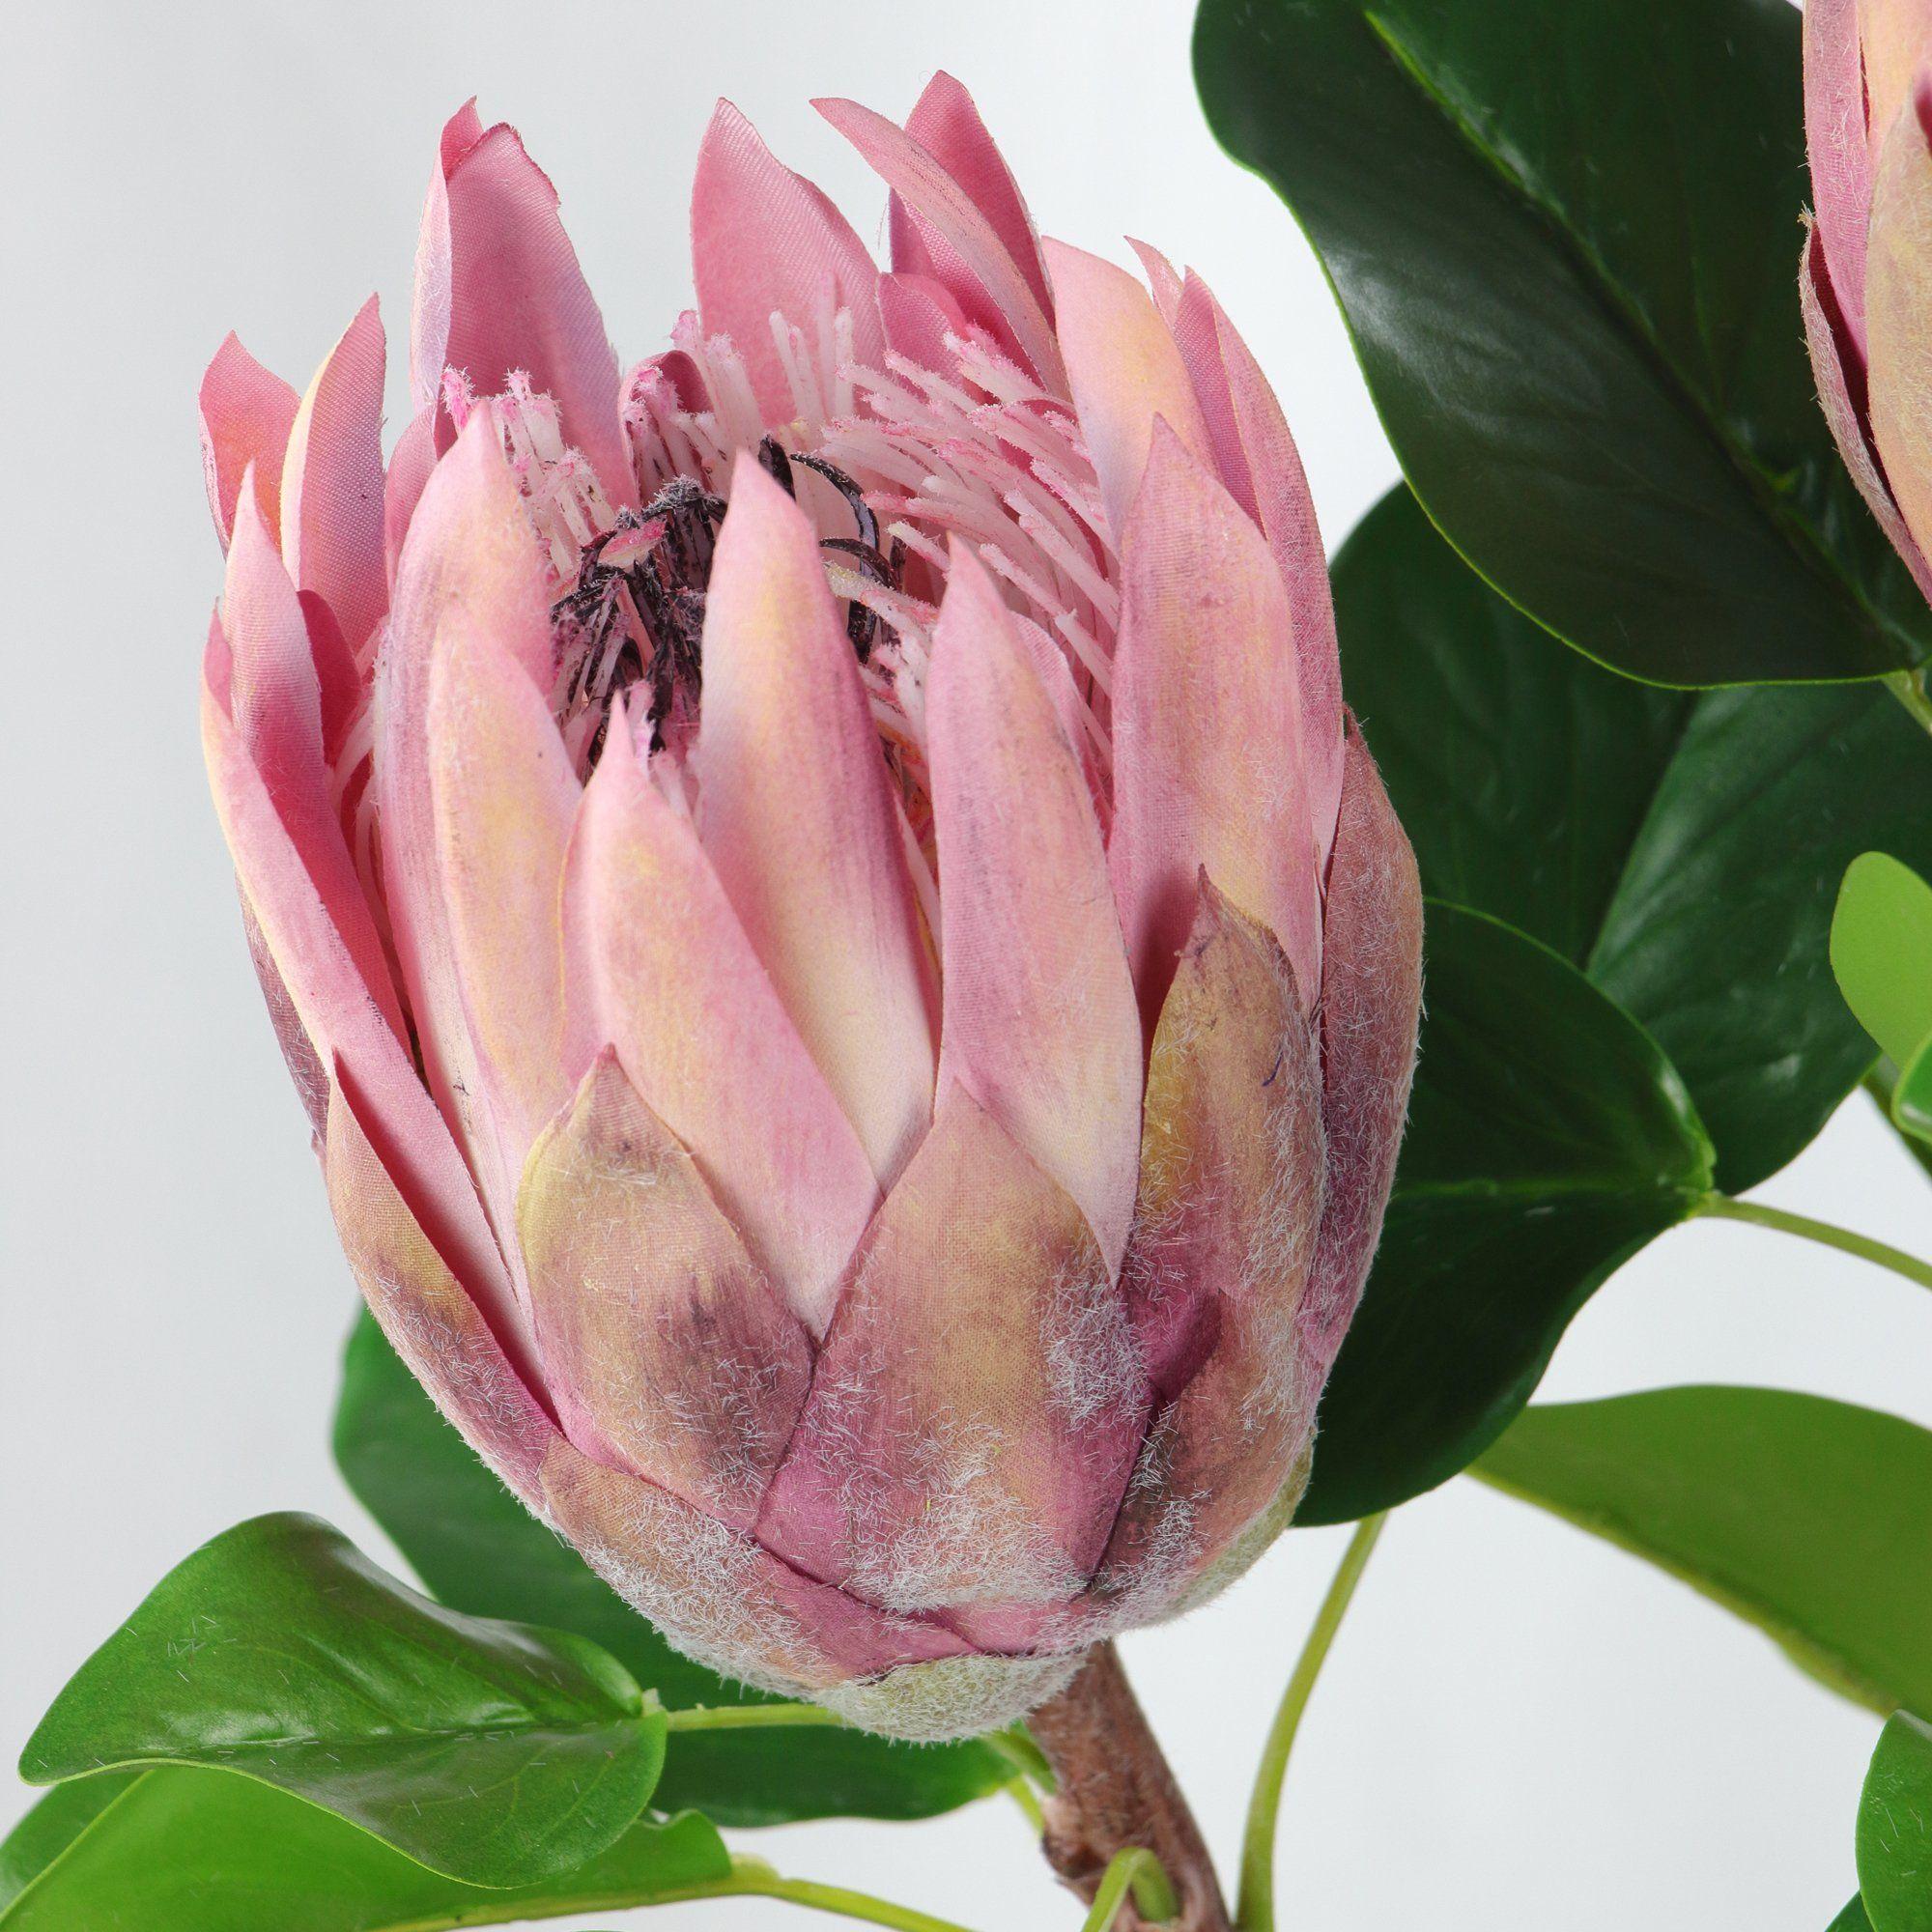 Rinlong Artificial Protea Cynaroides Silk Flower For Floral Arrangements Home Party Wedding Decor Silk Flowers Wedding Kitchen Flower Arrangements Silk Flowers